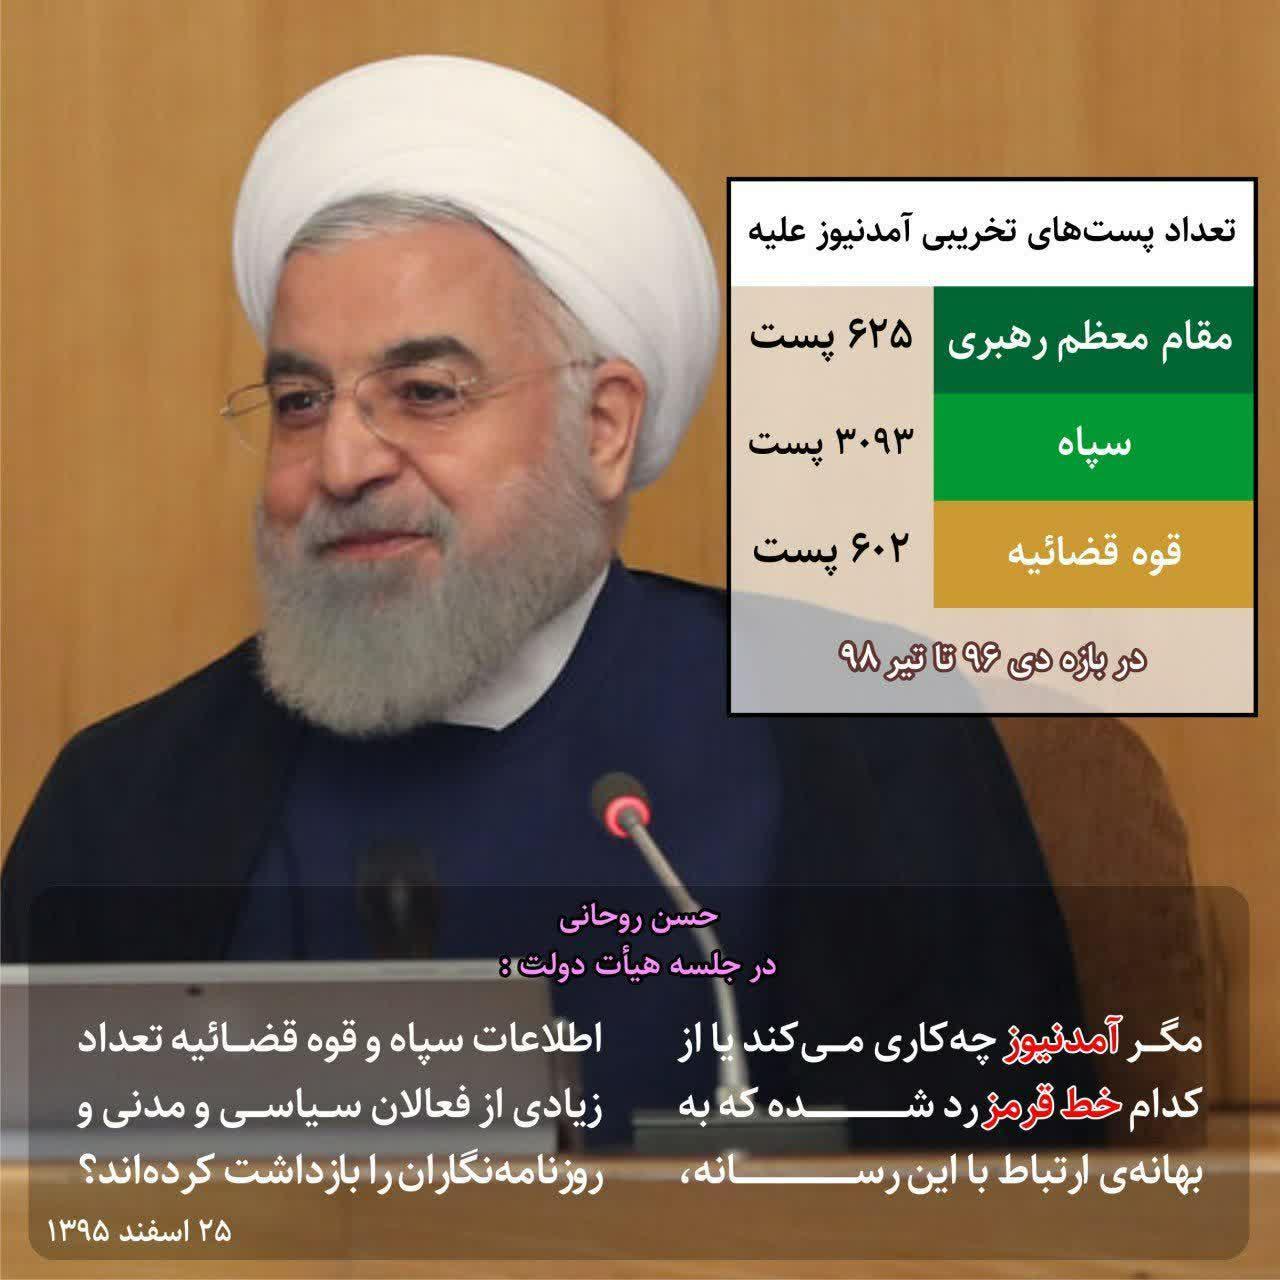 http://dl-abbasi.ir/yekta/1398/Graphic/Amadnews/amadnews%20(5).jpg